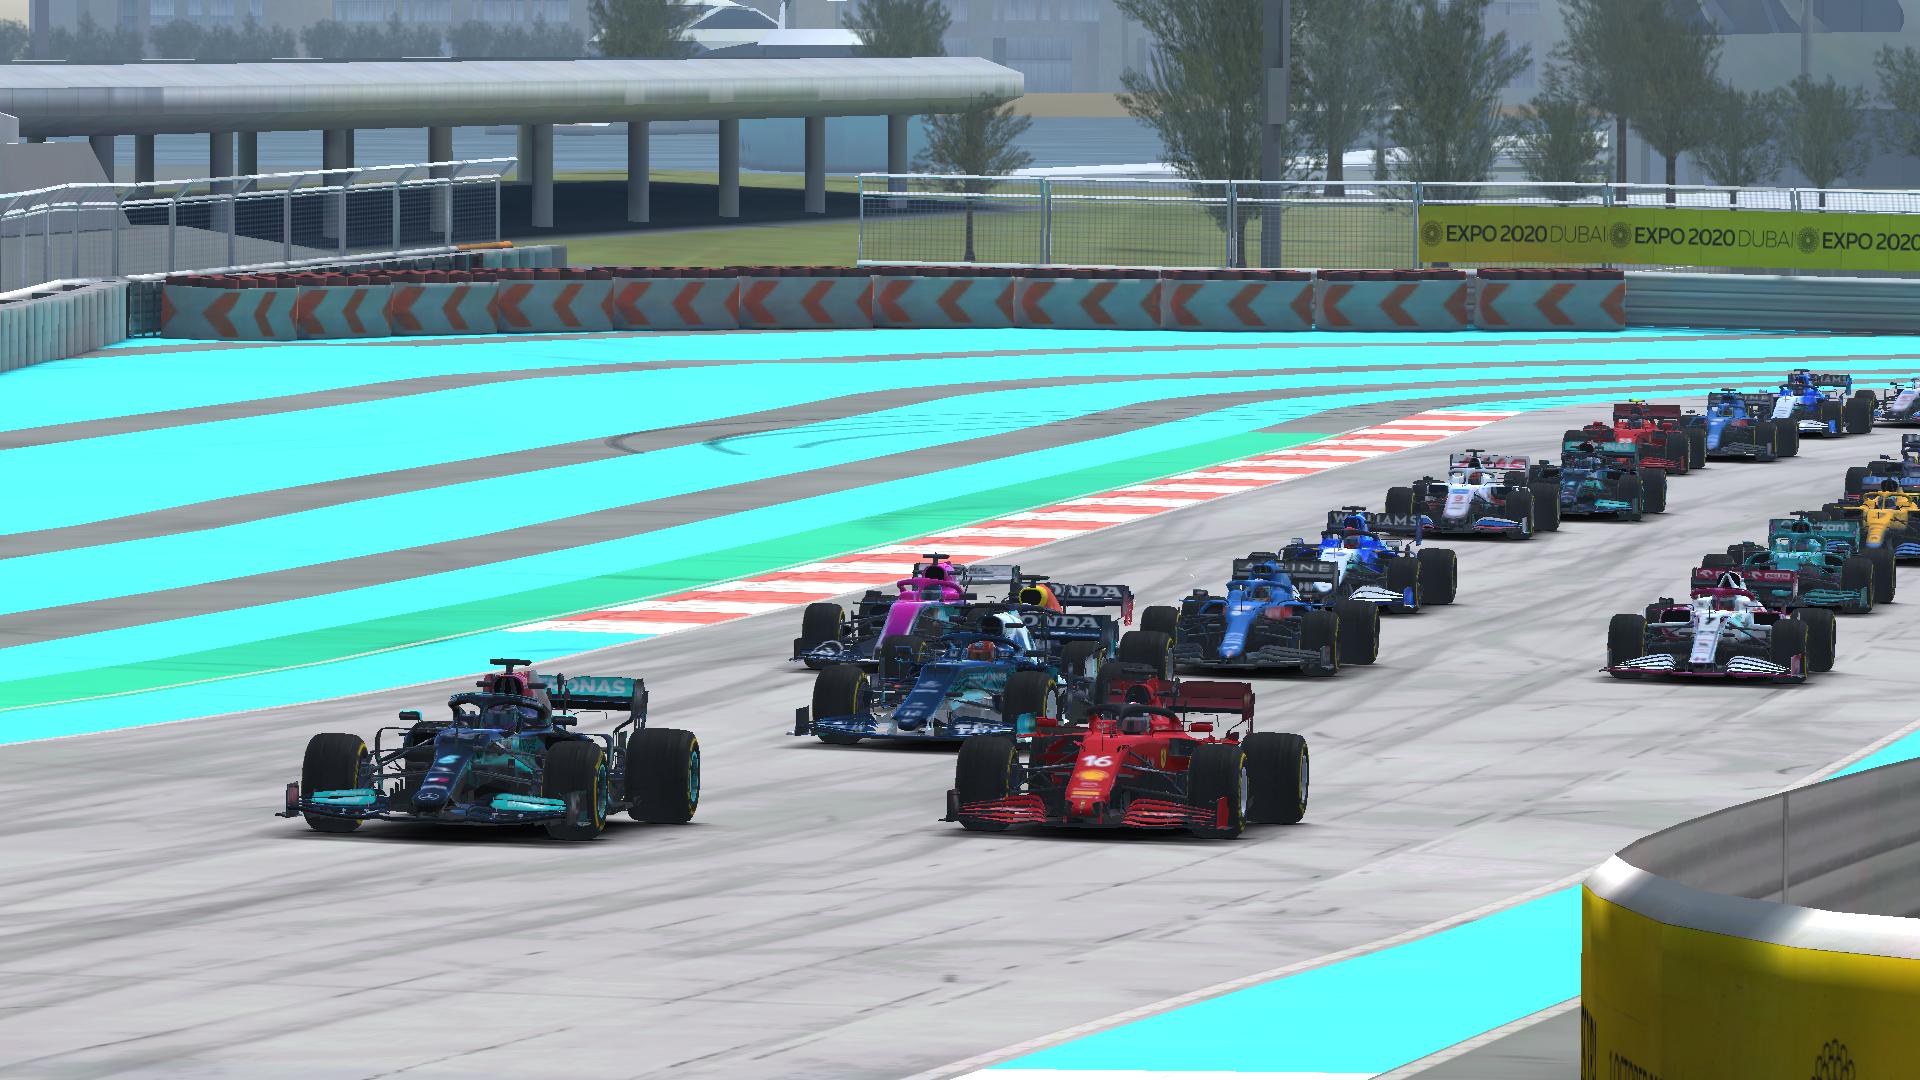 Real Racing 3 F1 Esports Abu Dhabi Pic